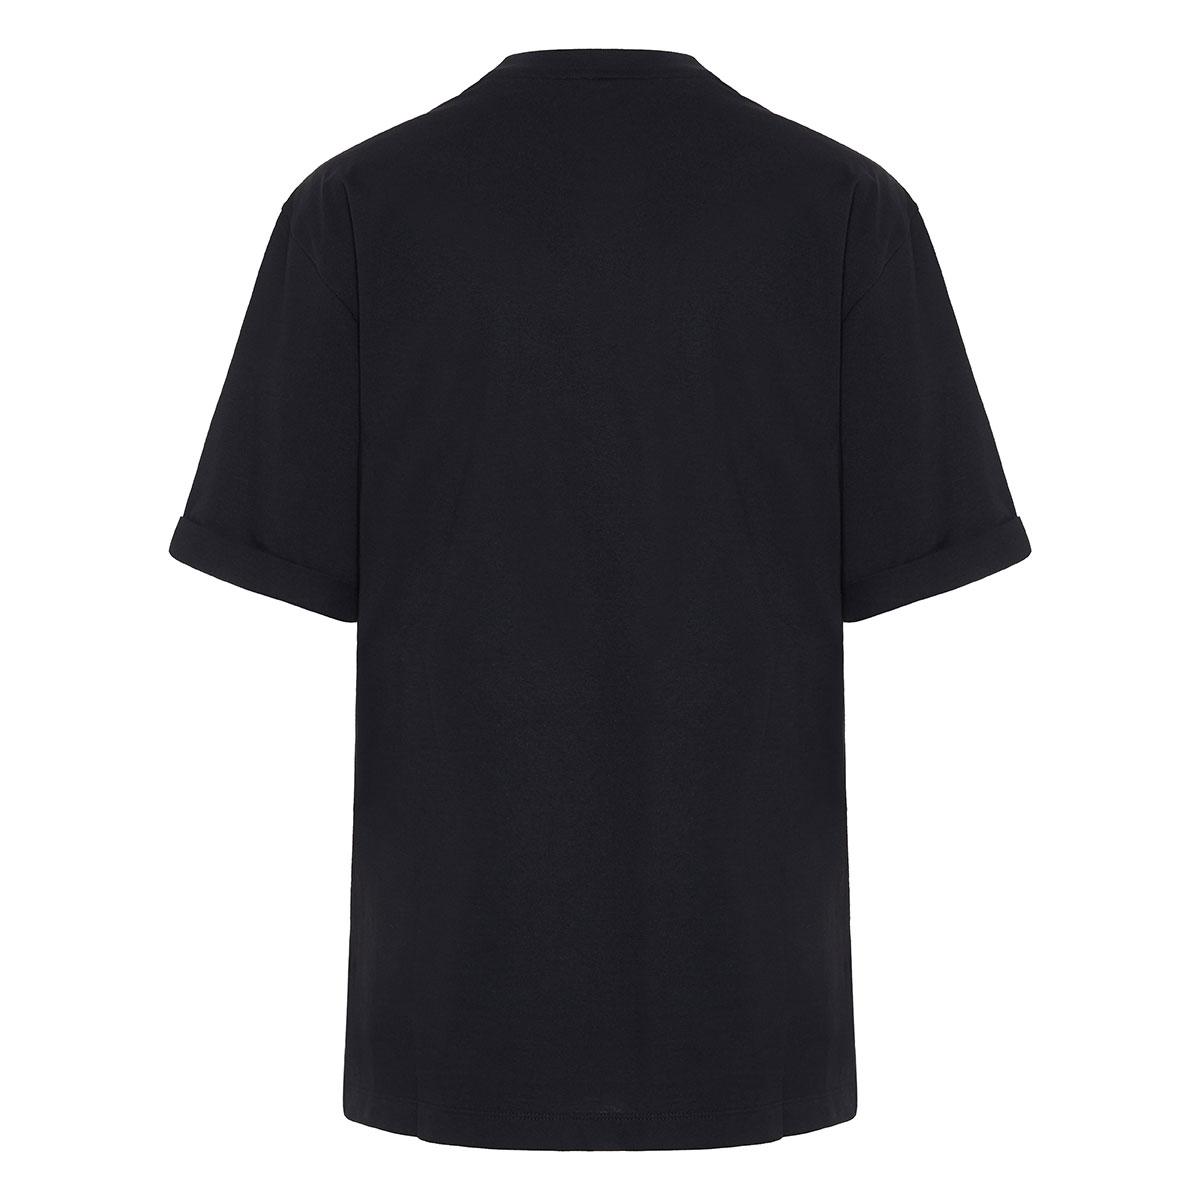 FF Karligraphy cotton t-shirt